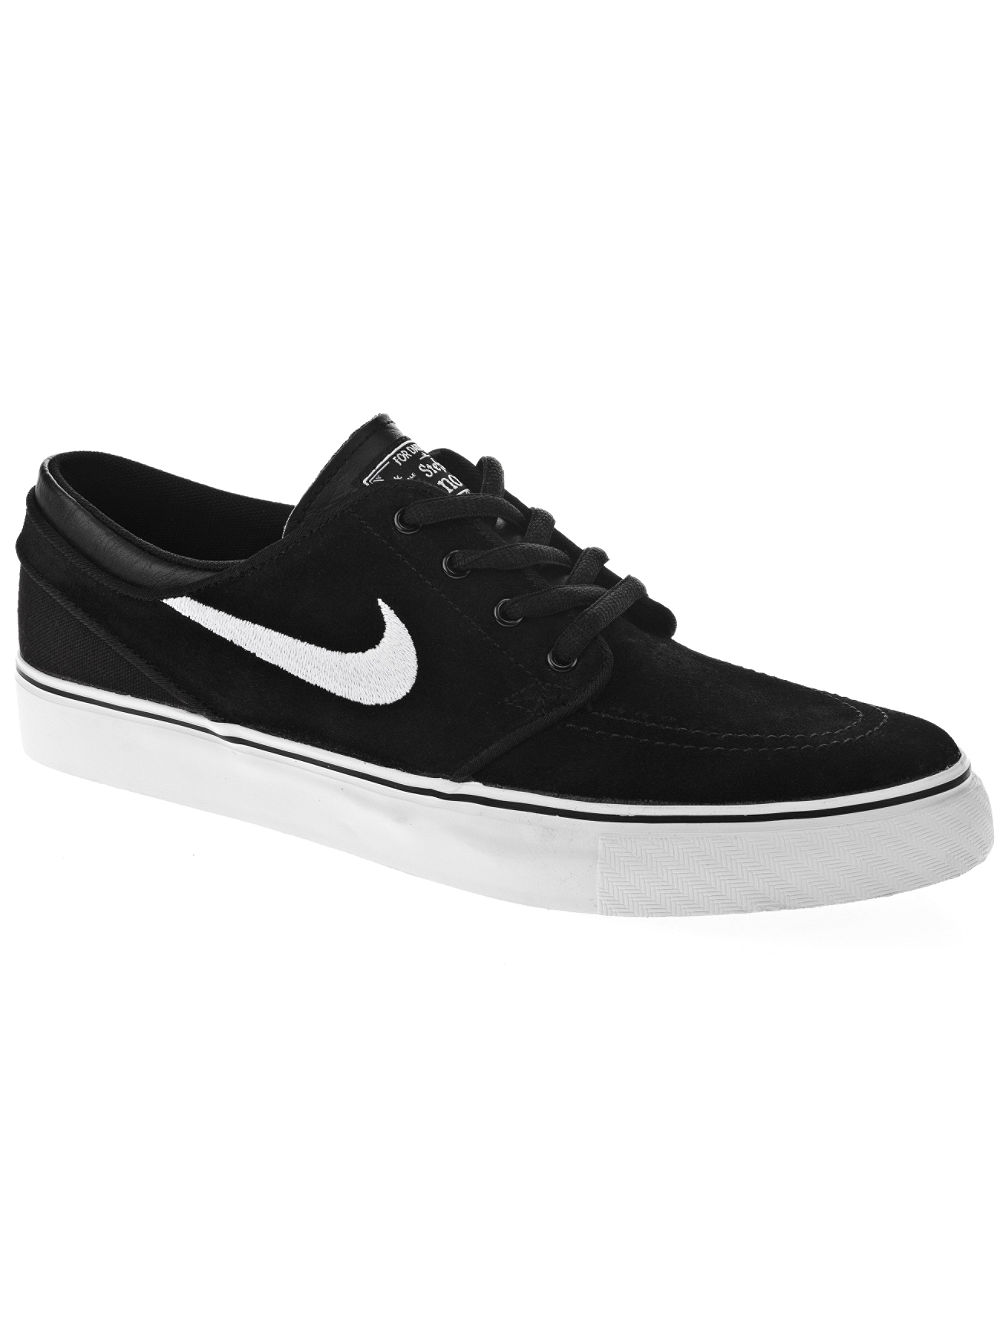 separation shoes 12541 49e39 Nike Stefan Janoski Skate Shoes